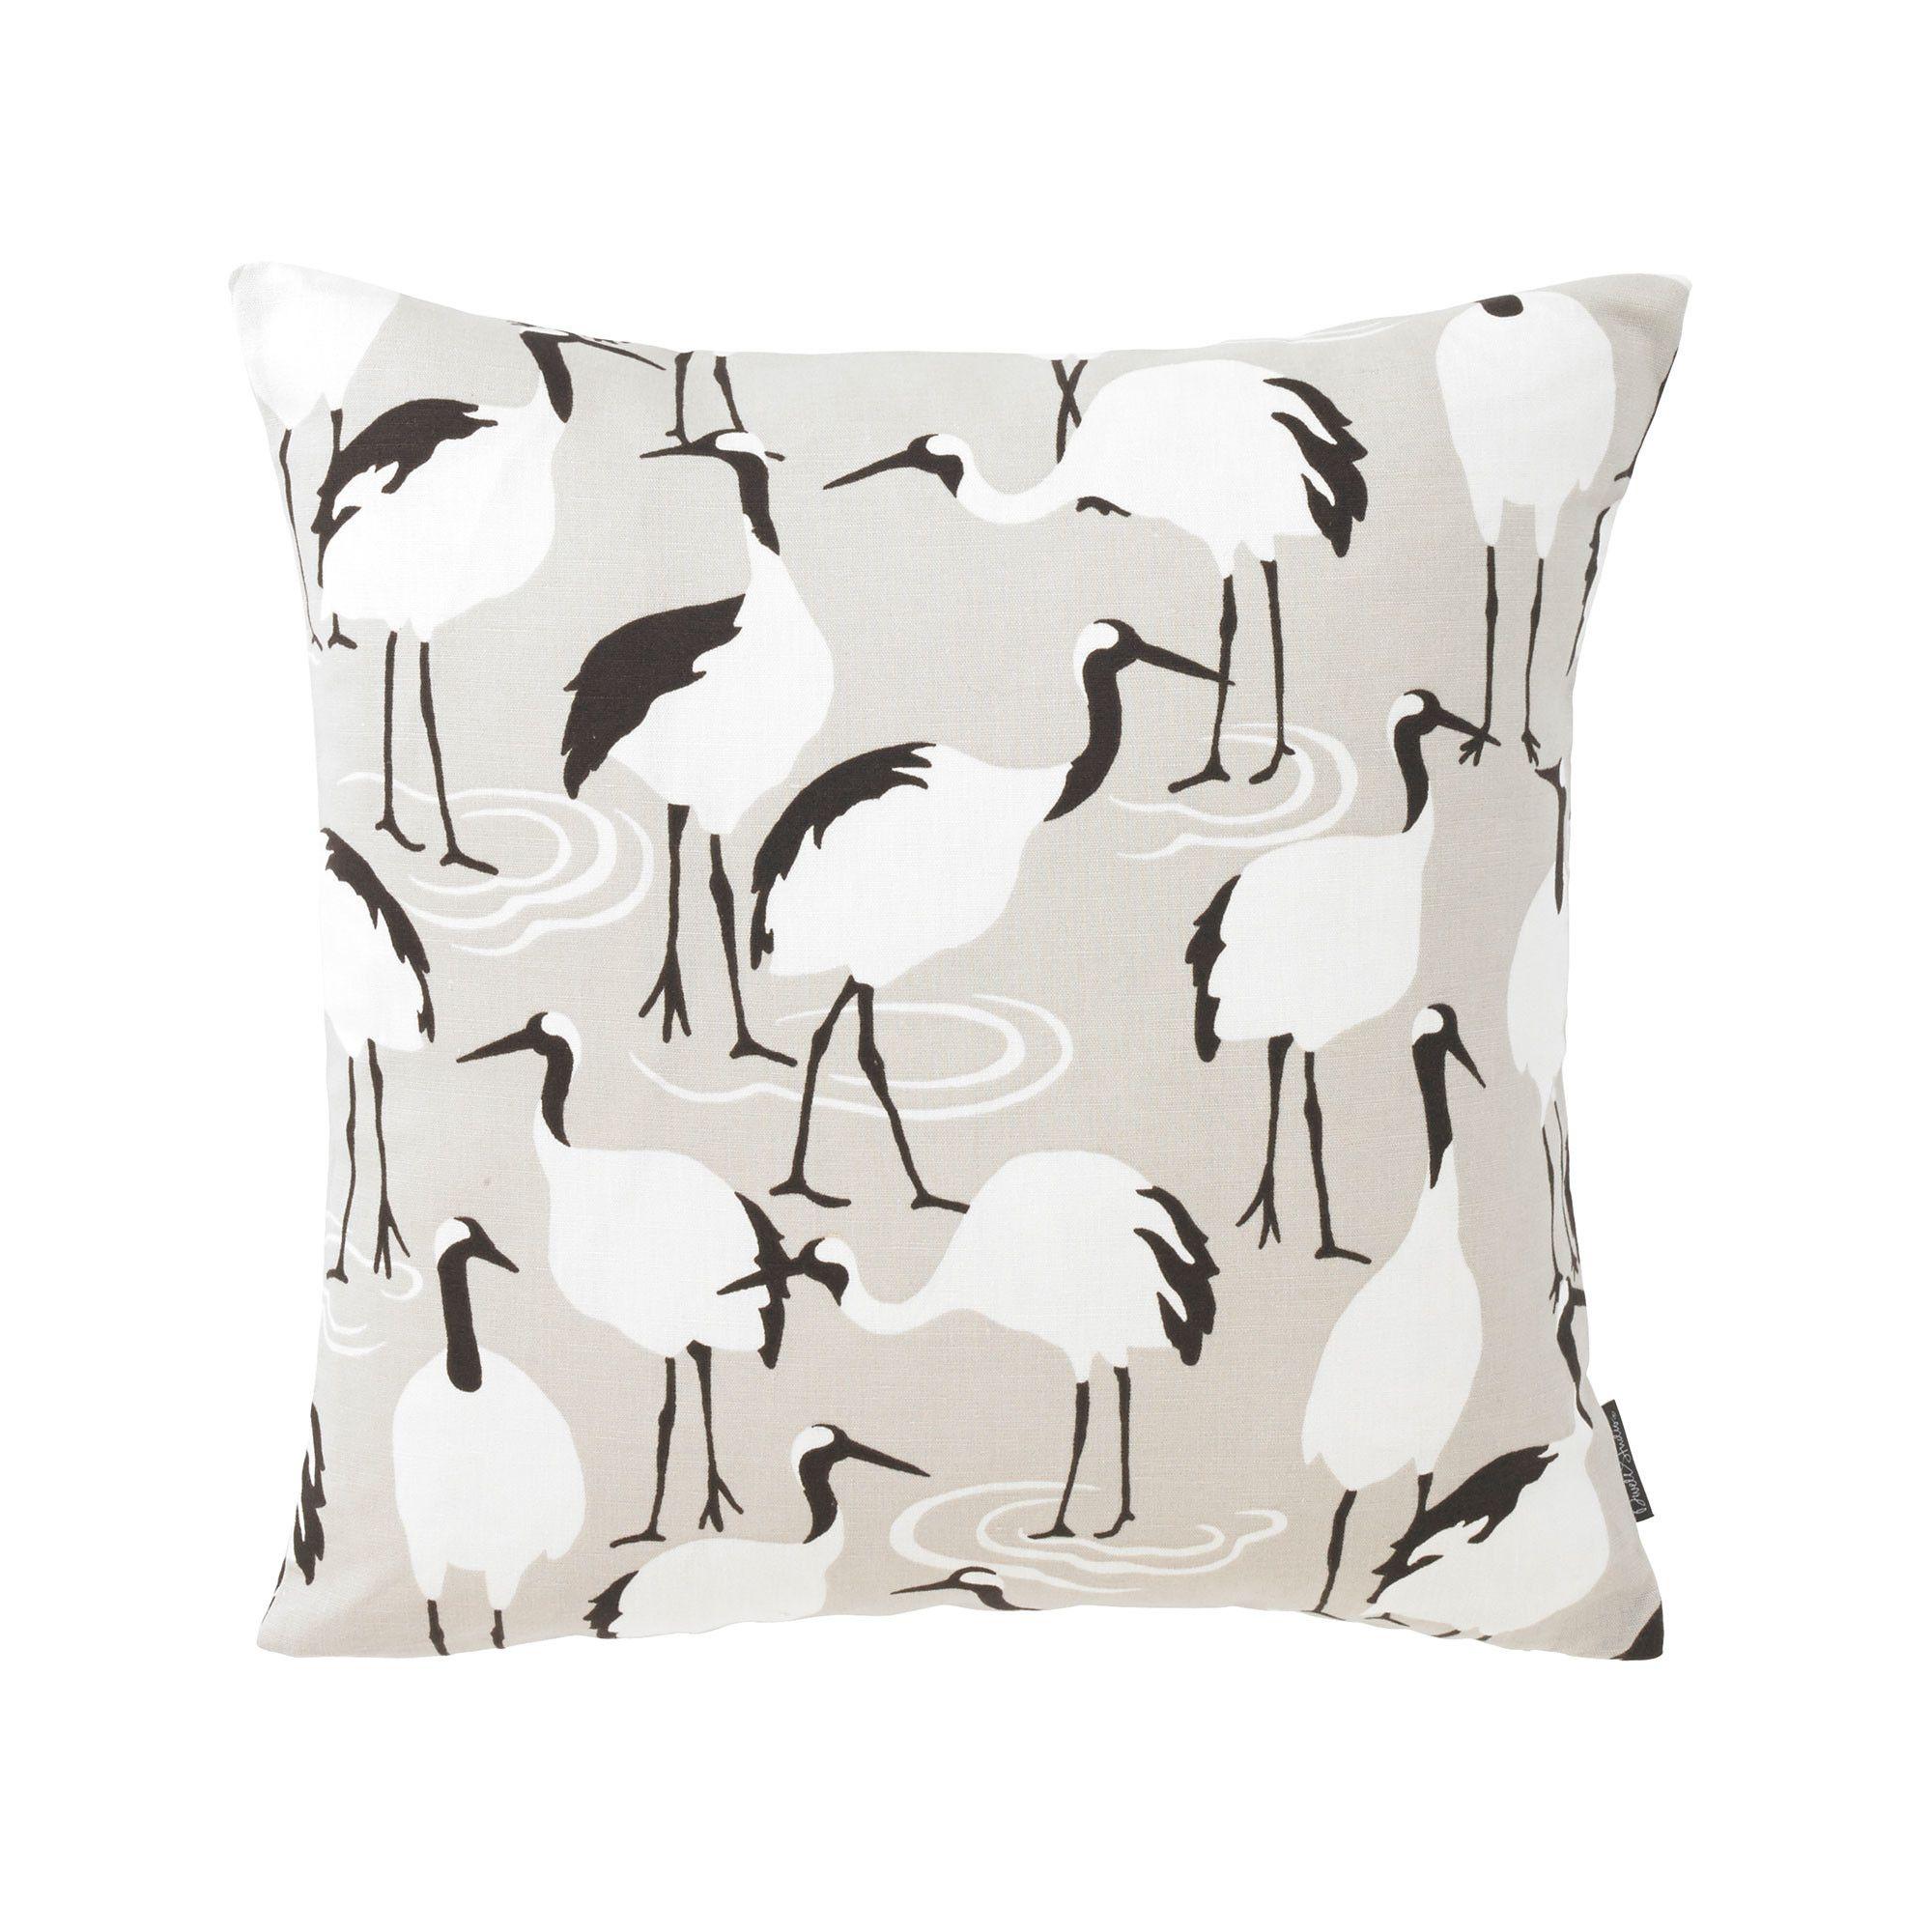 dwellstudio winter crane pillow  dwellstudio  for my home  - dwellstudio winter crane pillow  dwellstudio